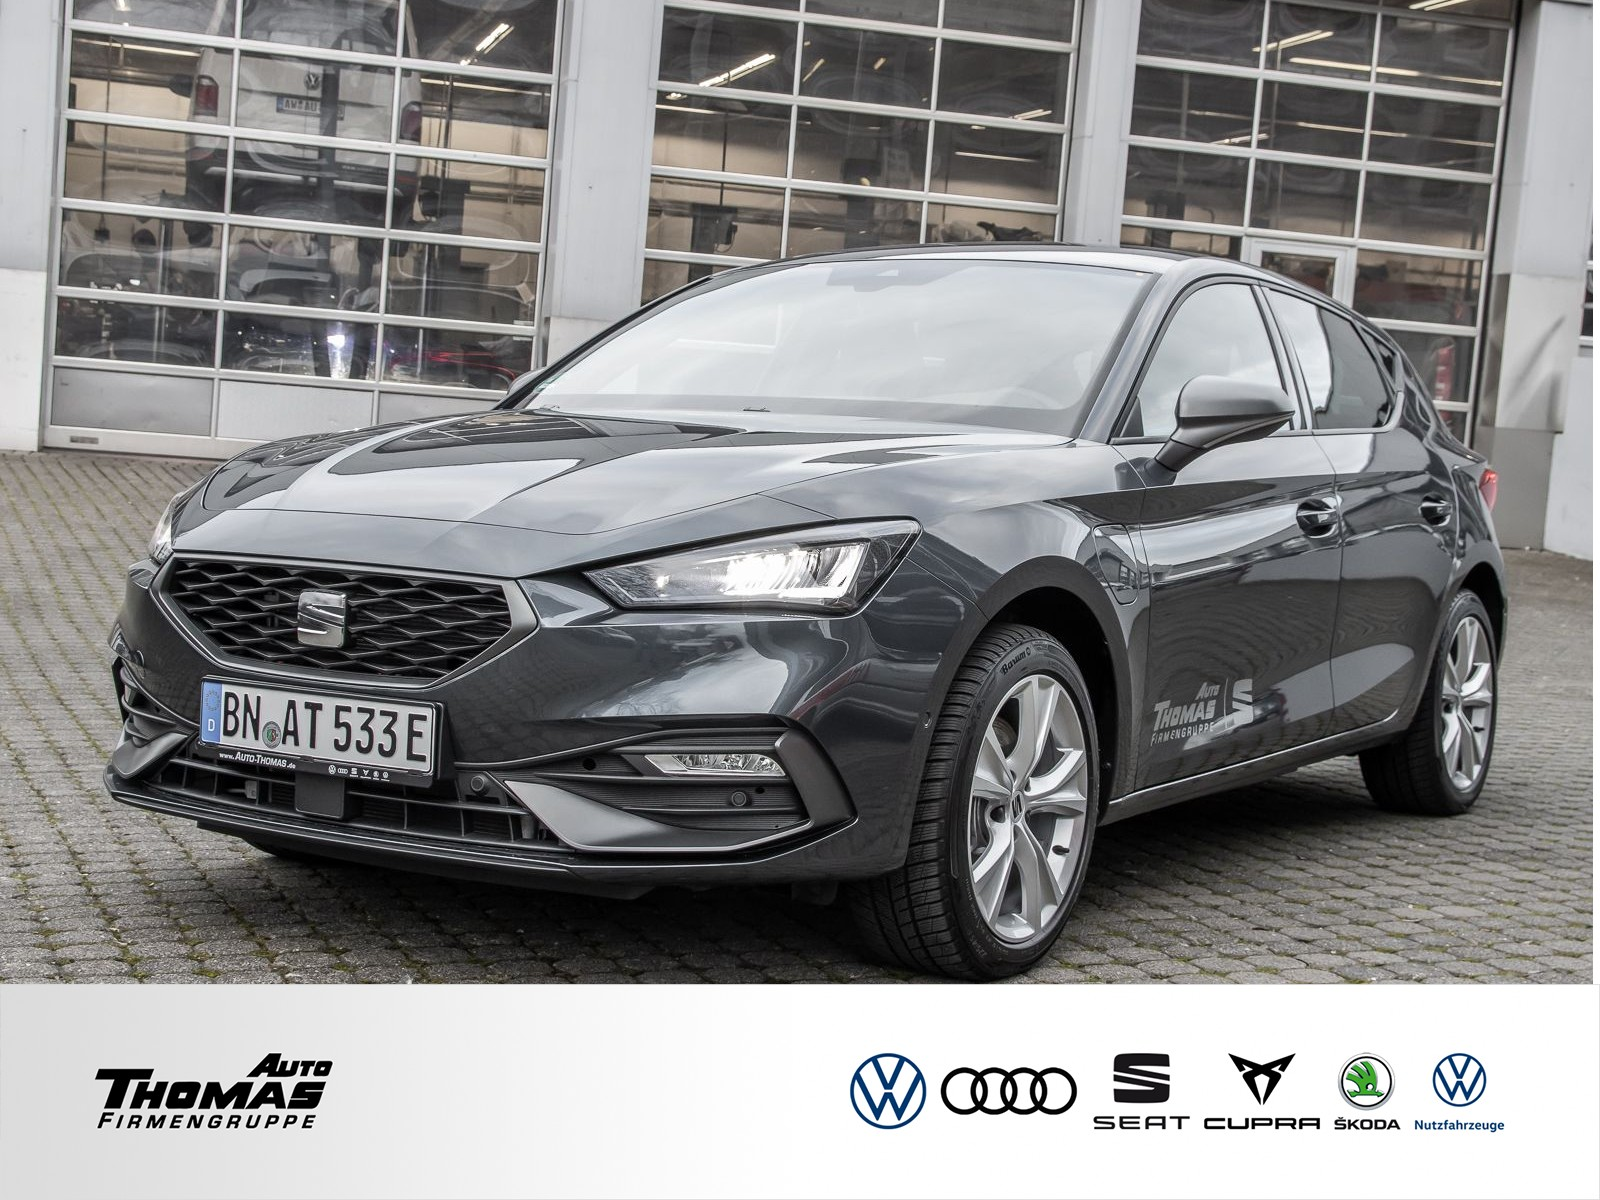 Seat Leon FR 1.4 e-Hybrid DSG+KAMERA+KESSY+VOLL-LED, Jahr 2020, Hybrid